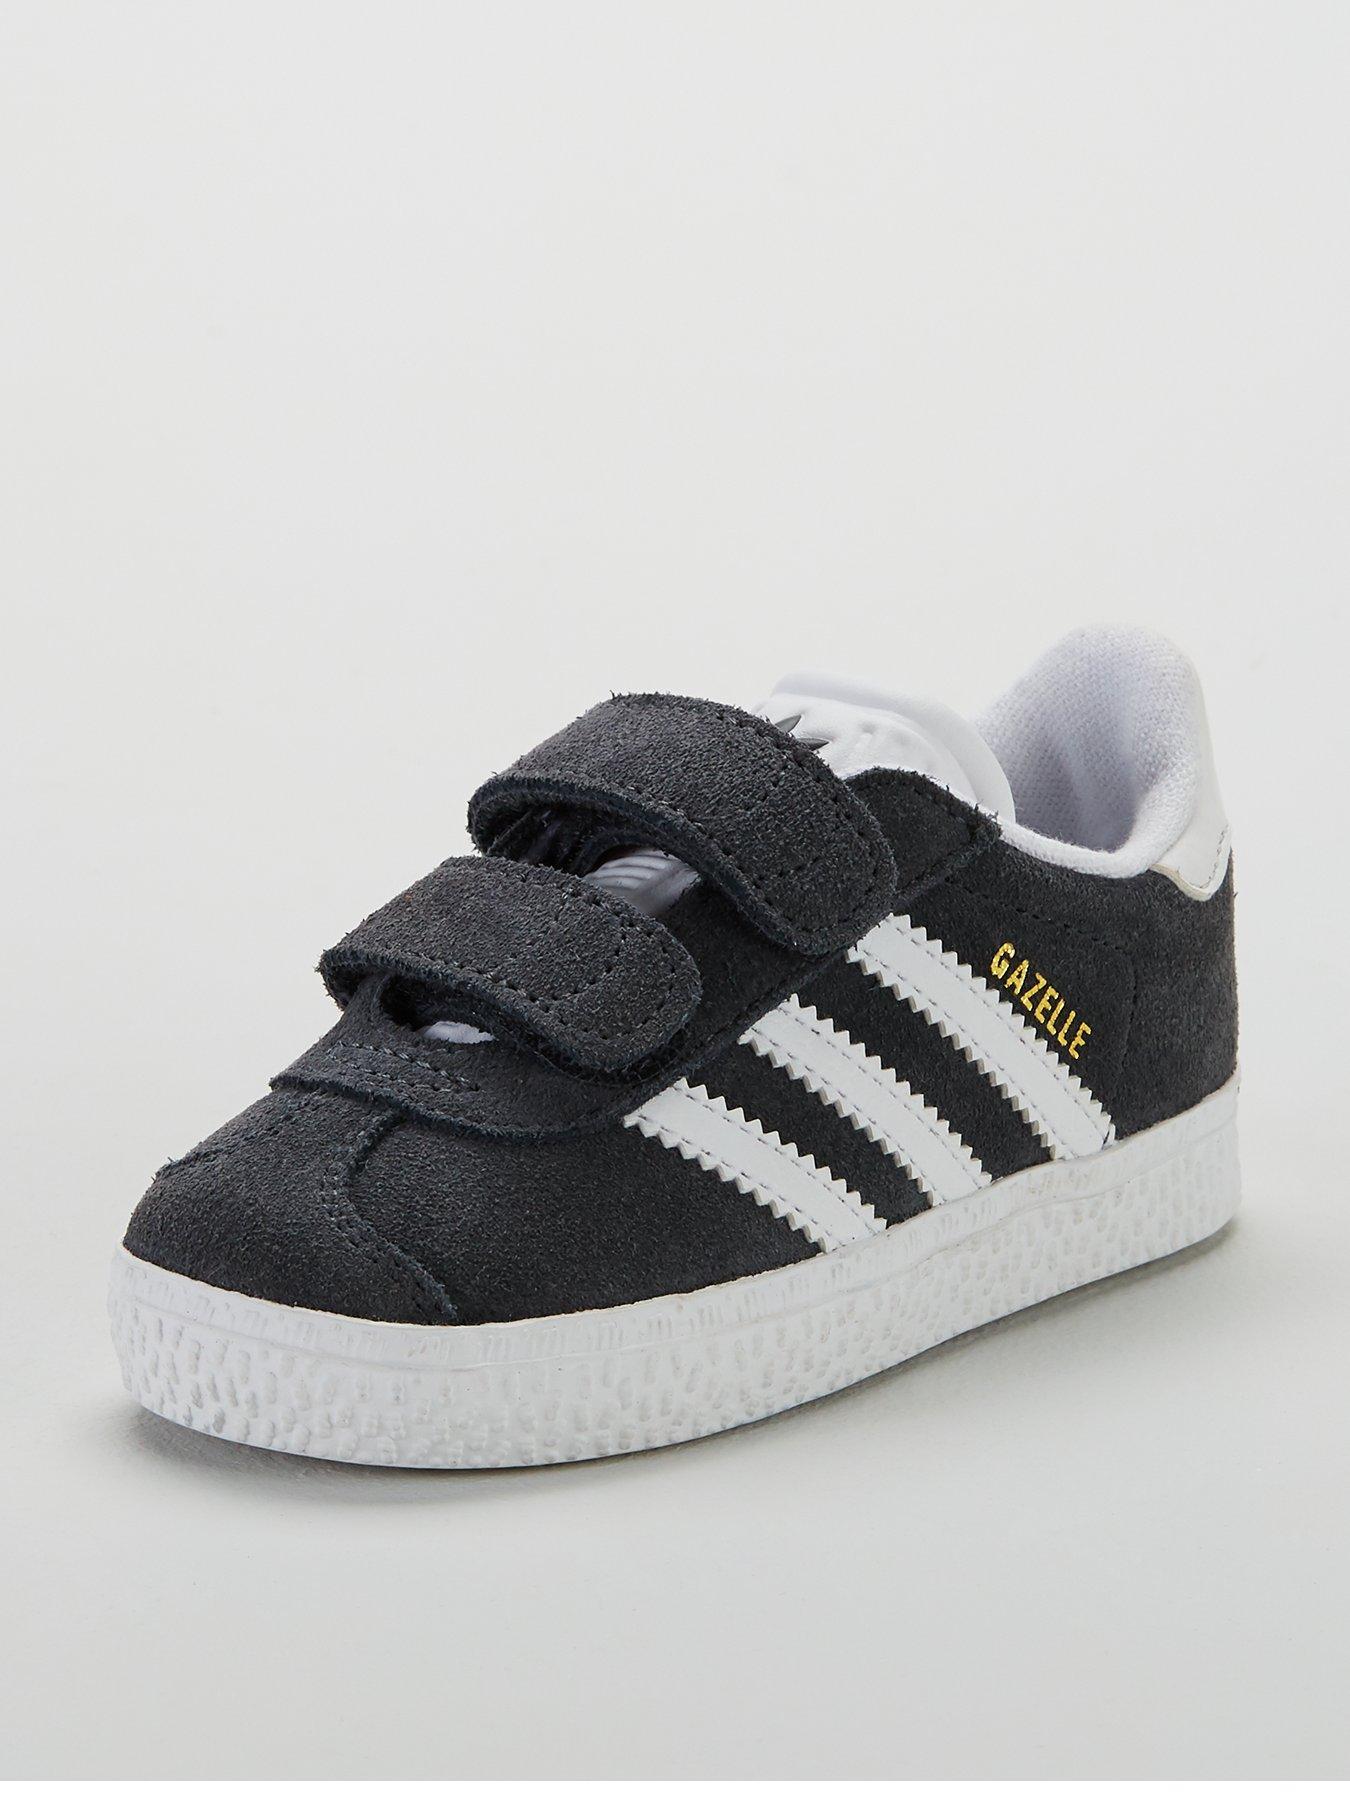 adidas Originals Gazelle Infant Trainer